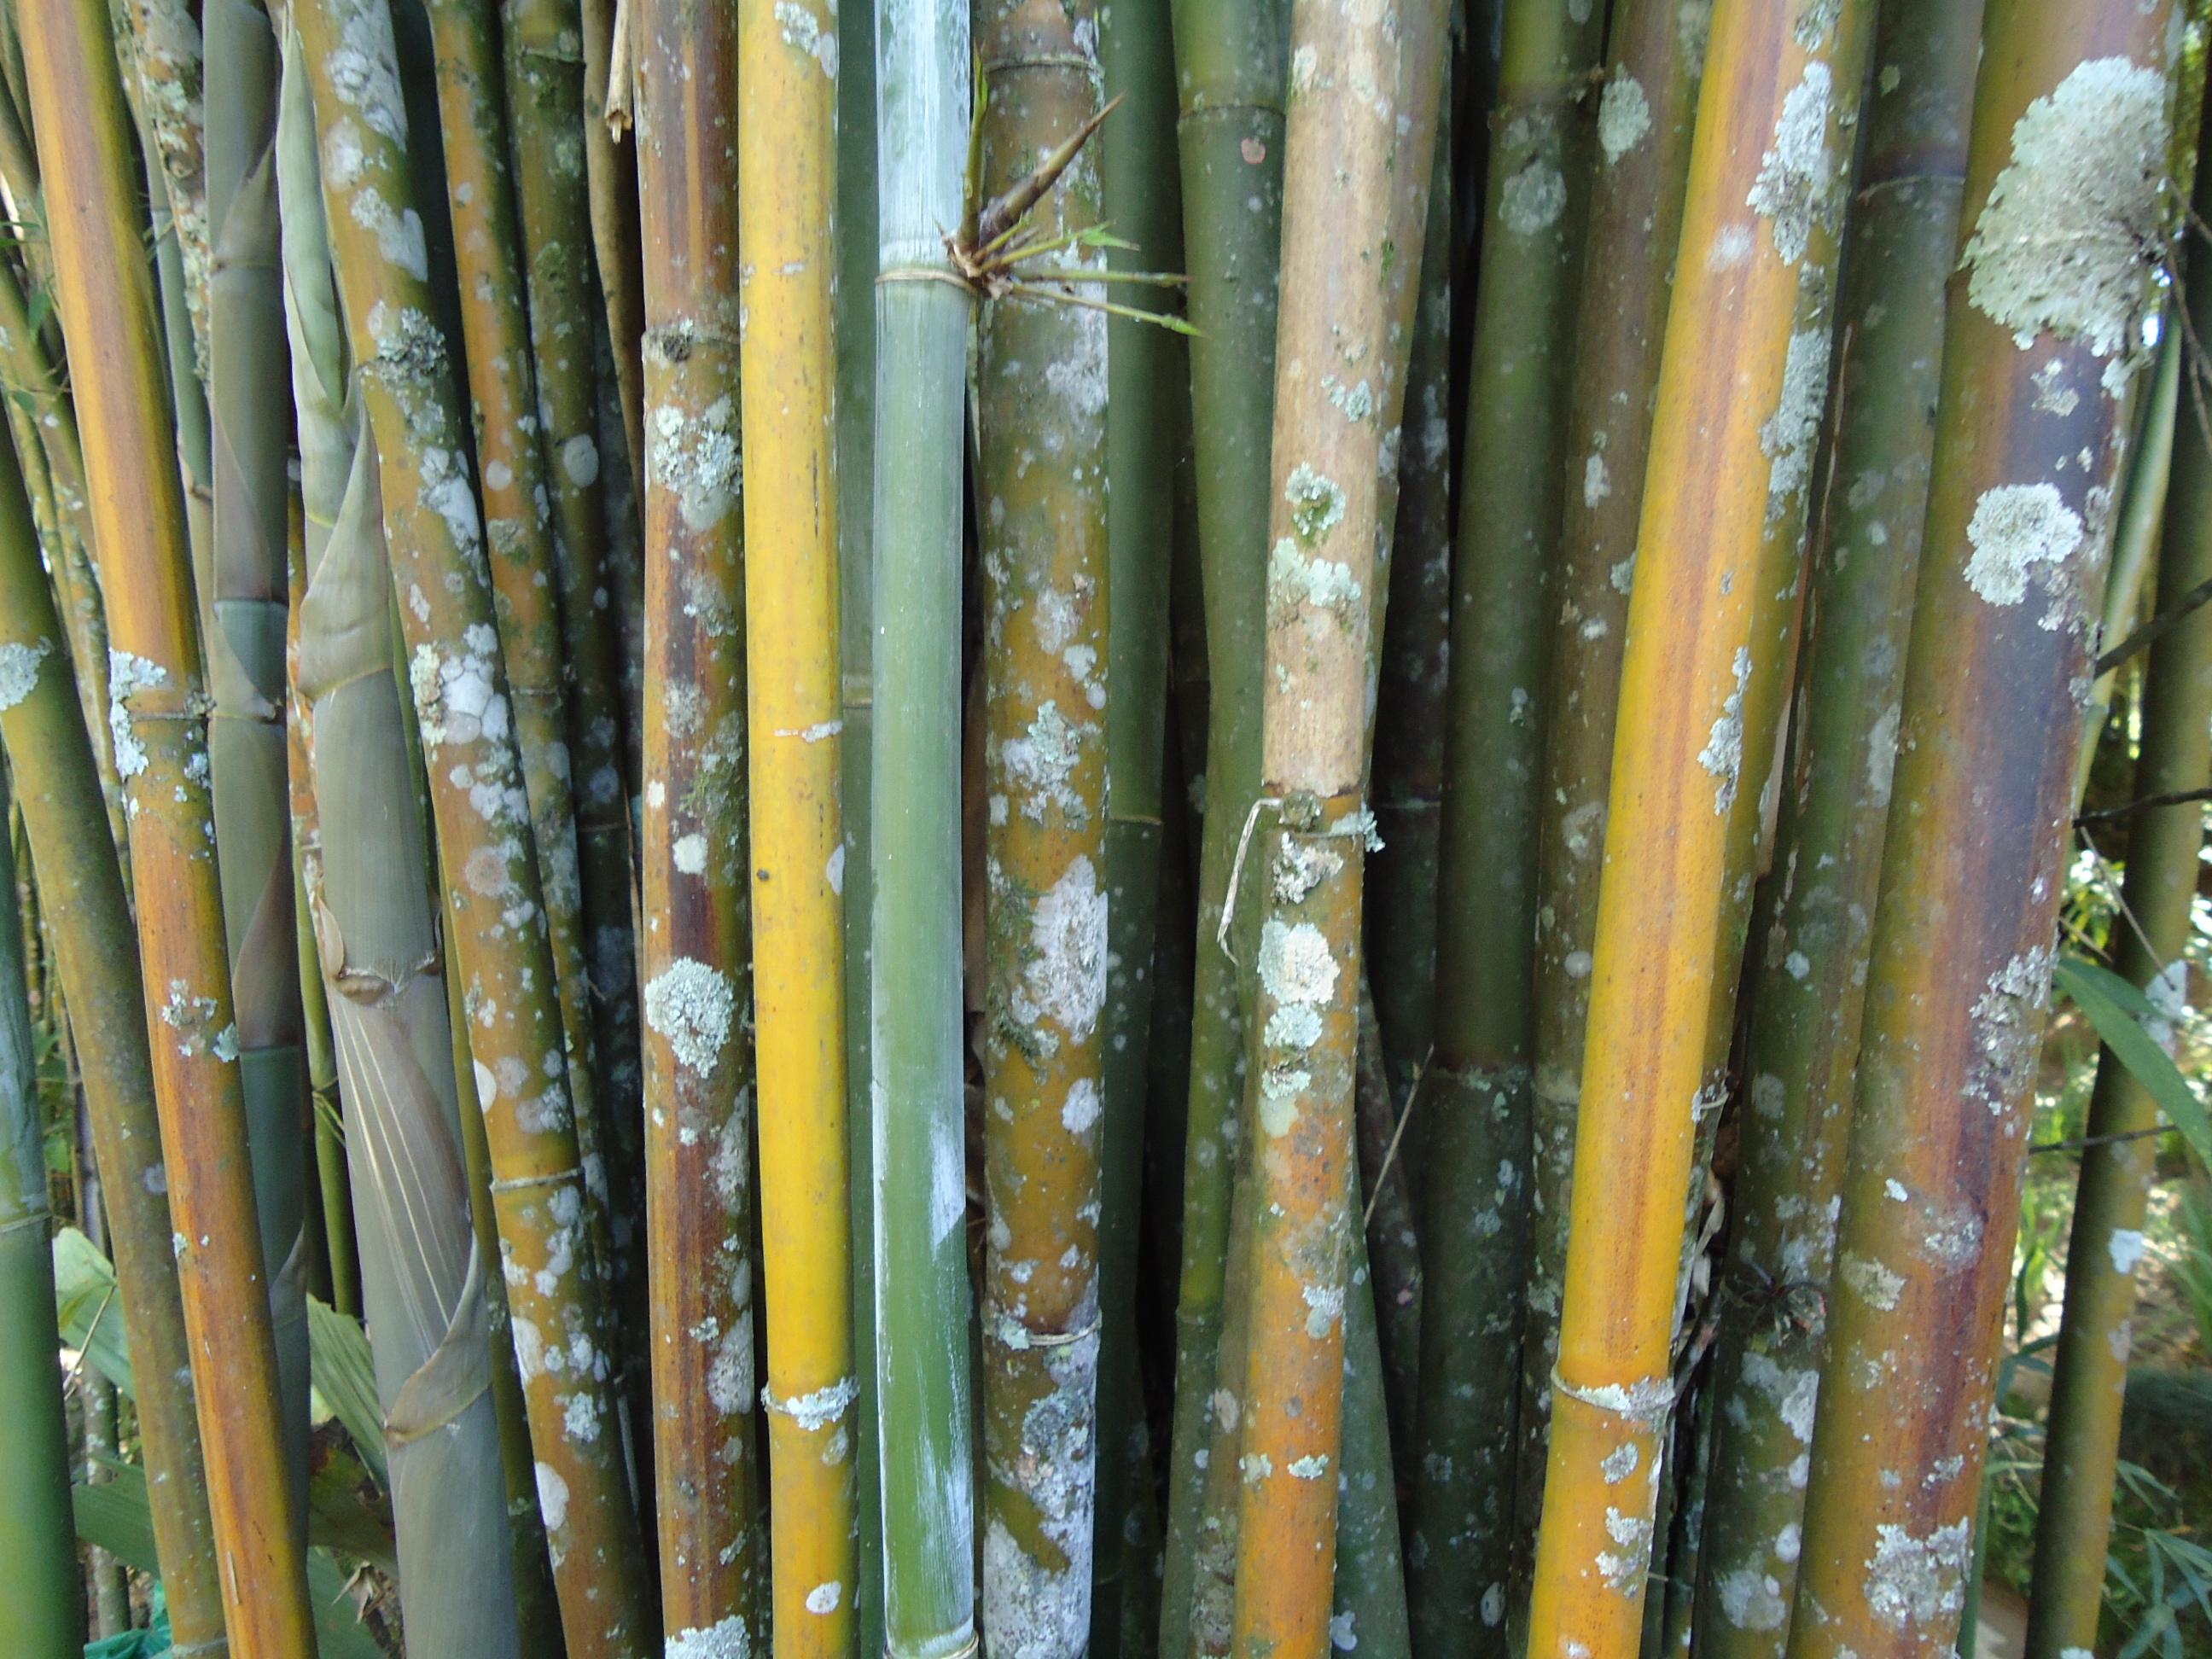 Bamboo with fungus, Bamboo, Fungus, Green, Organic, HQ Photo